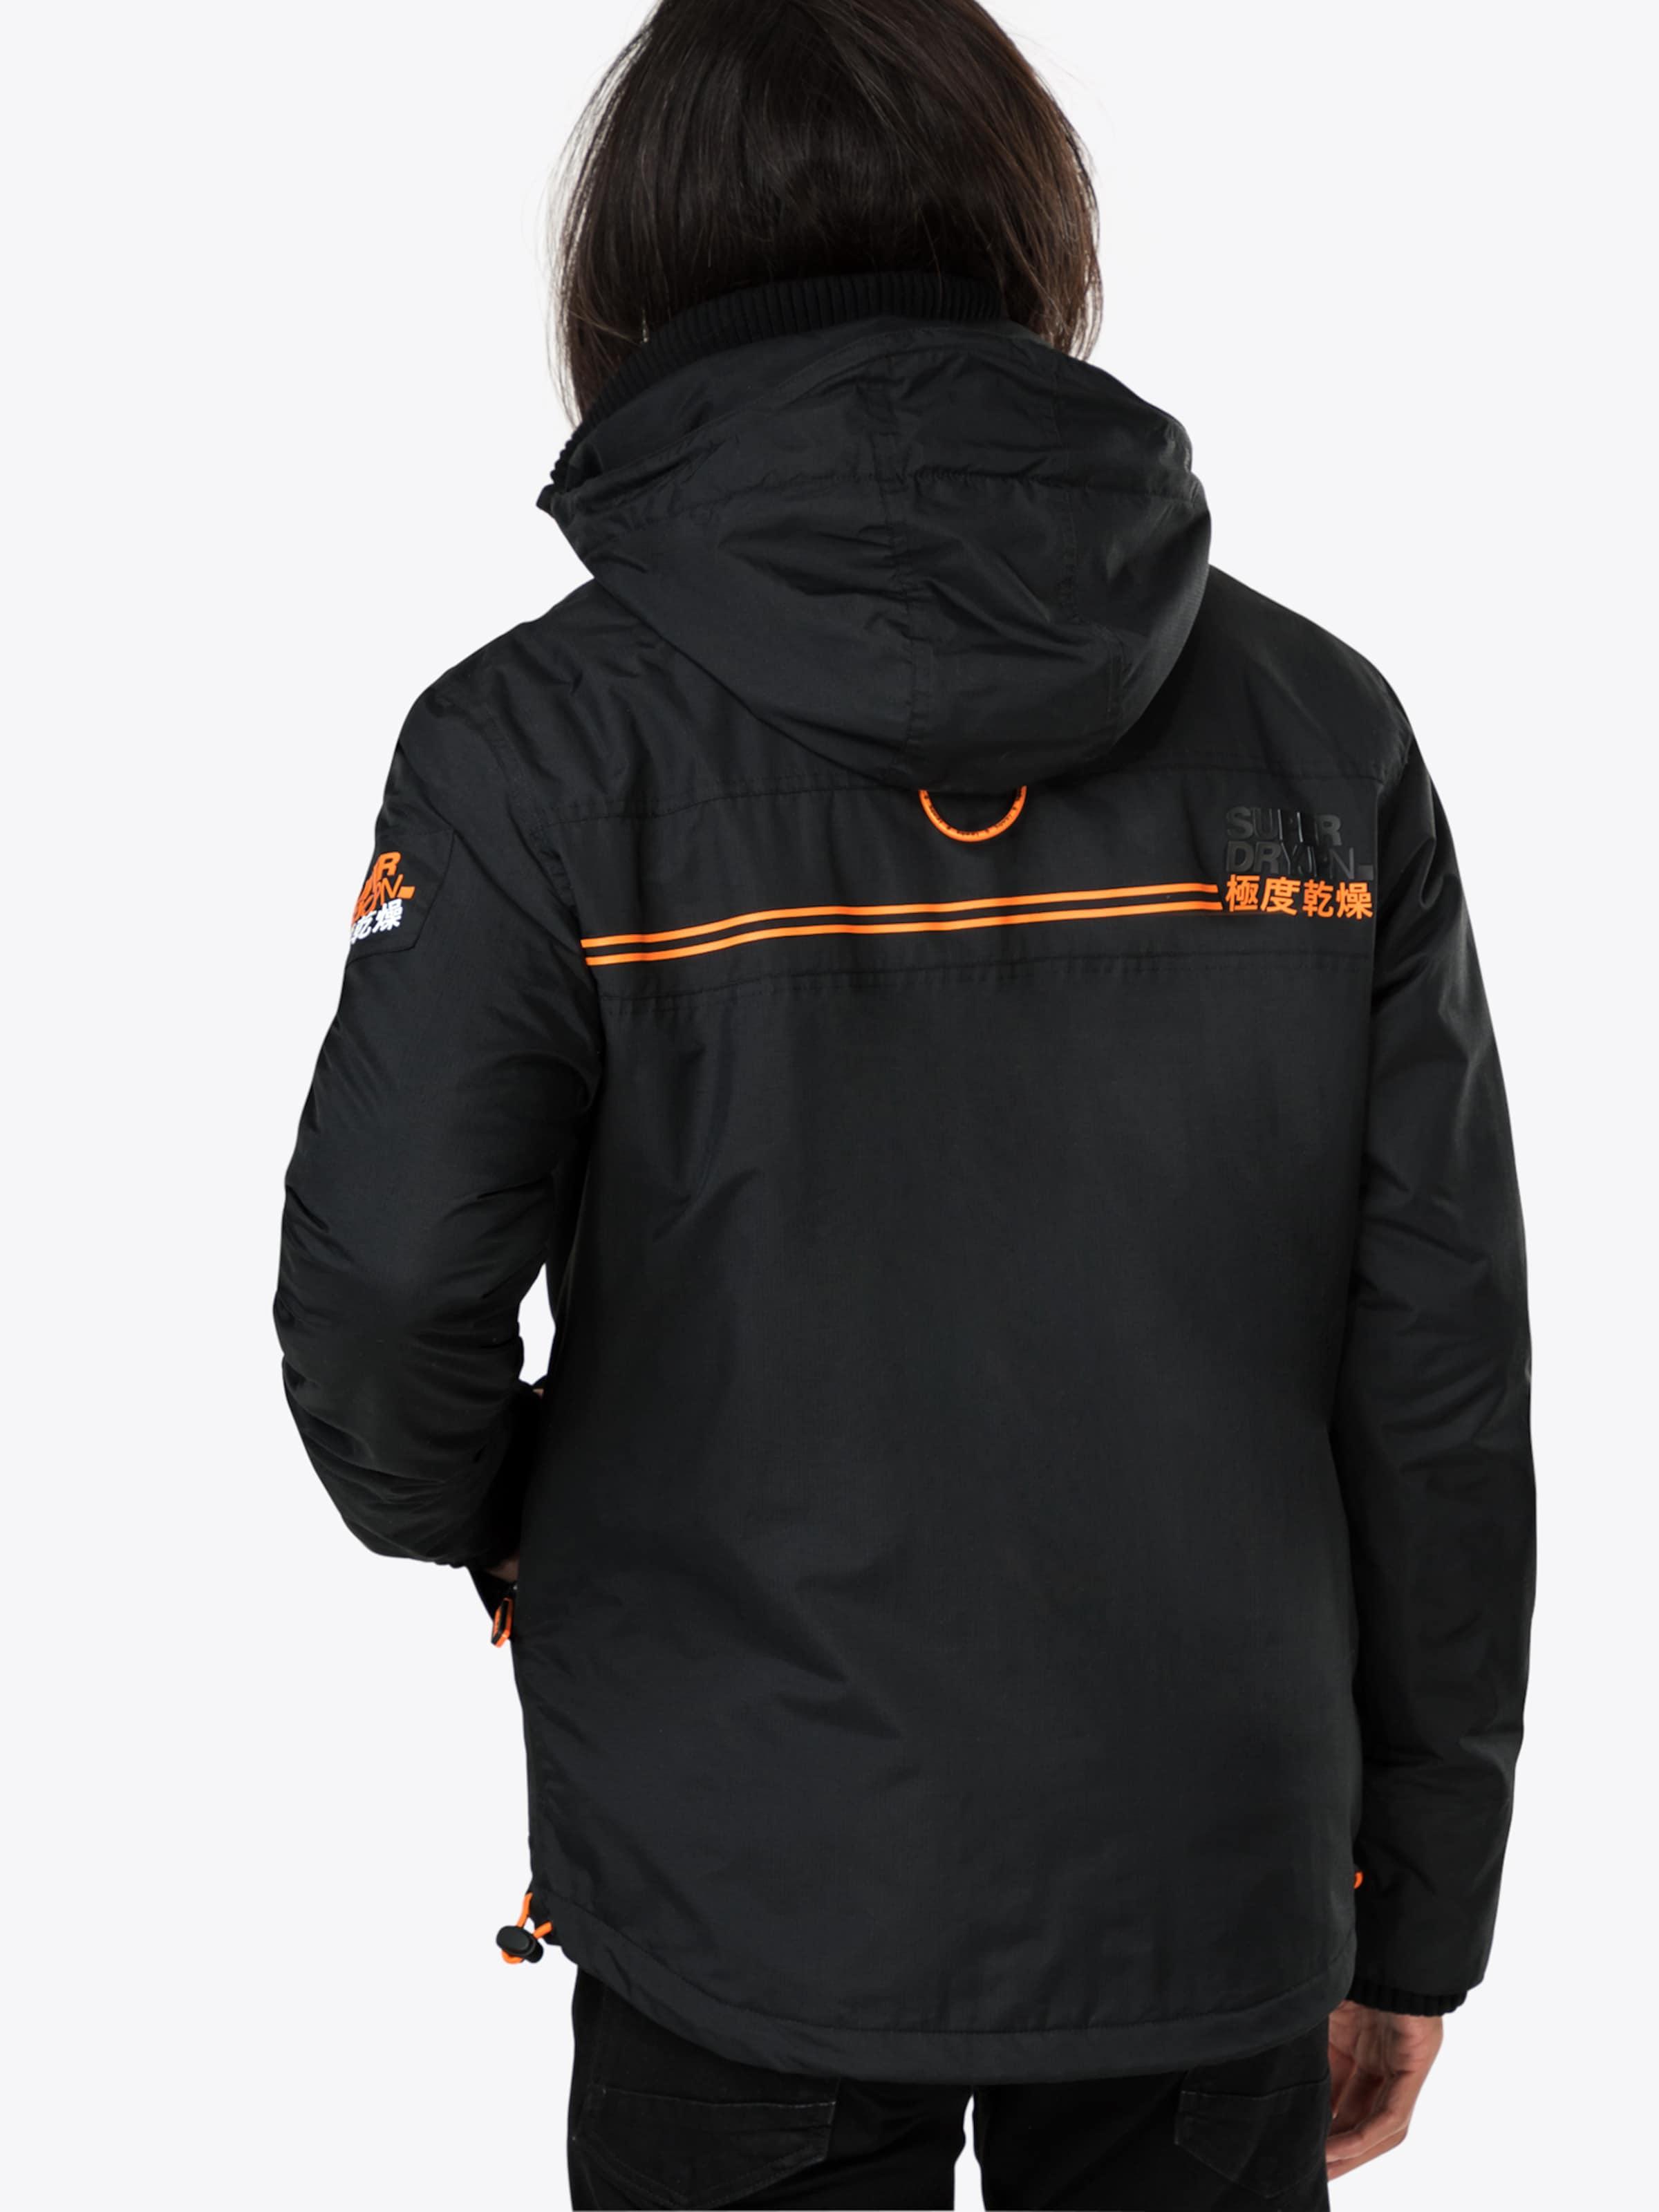 Veste Mi En saison Attacker' OrangeNoir Superdry Polar Wind 'hooded qSAc5jL4R3